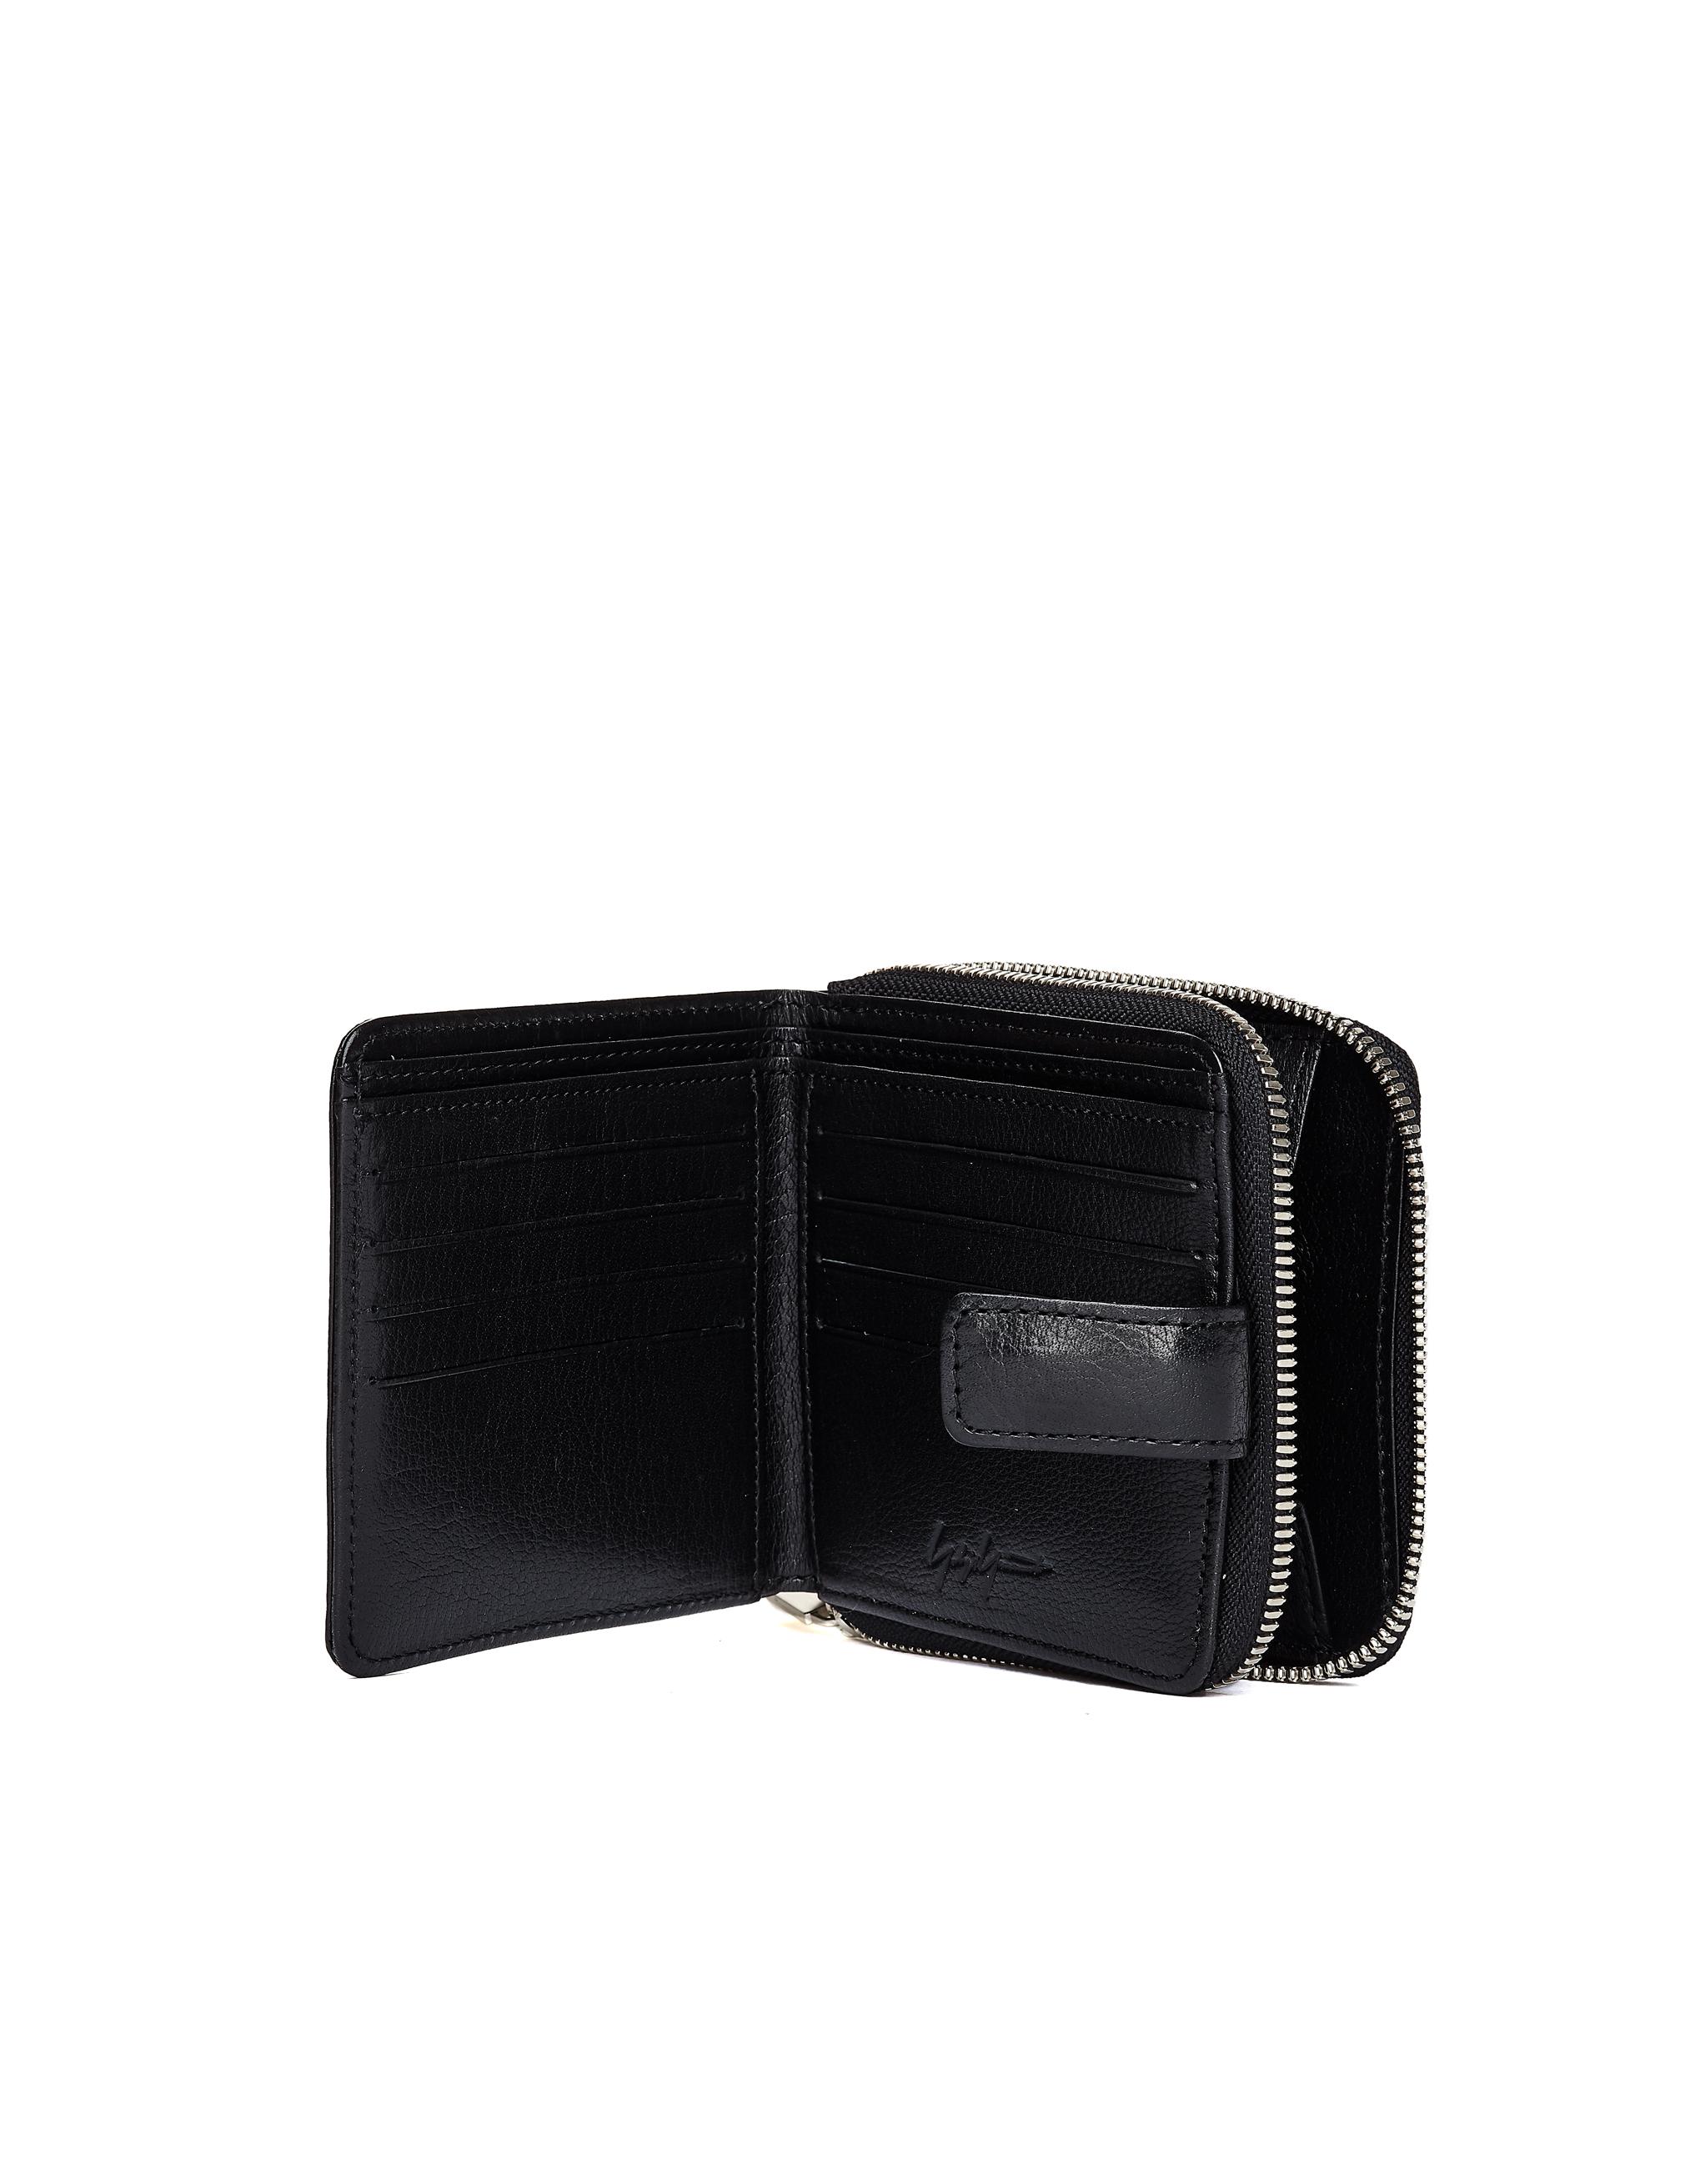 YOHJI YAMAMOTO | Черный кожаный кошелек | Clouty